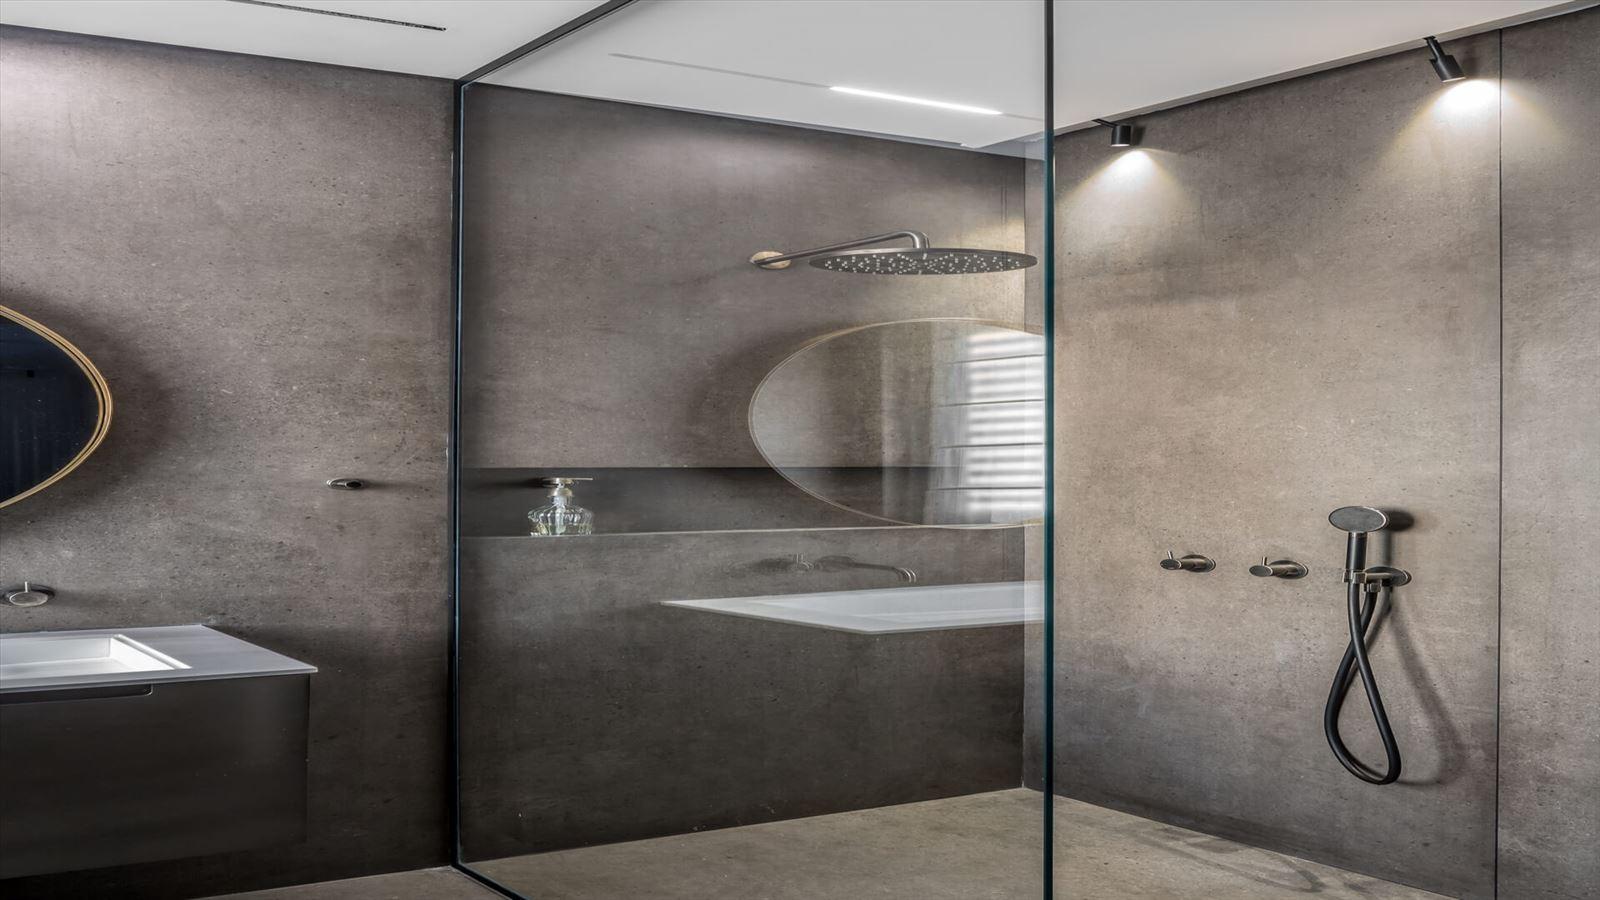 Penthouse Carmelit - עיצוב תאורת האמבטיה על ידי קמחי תאורה